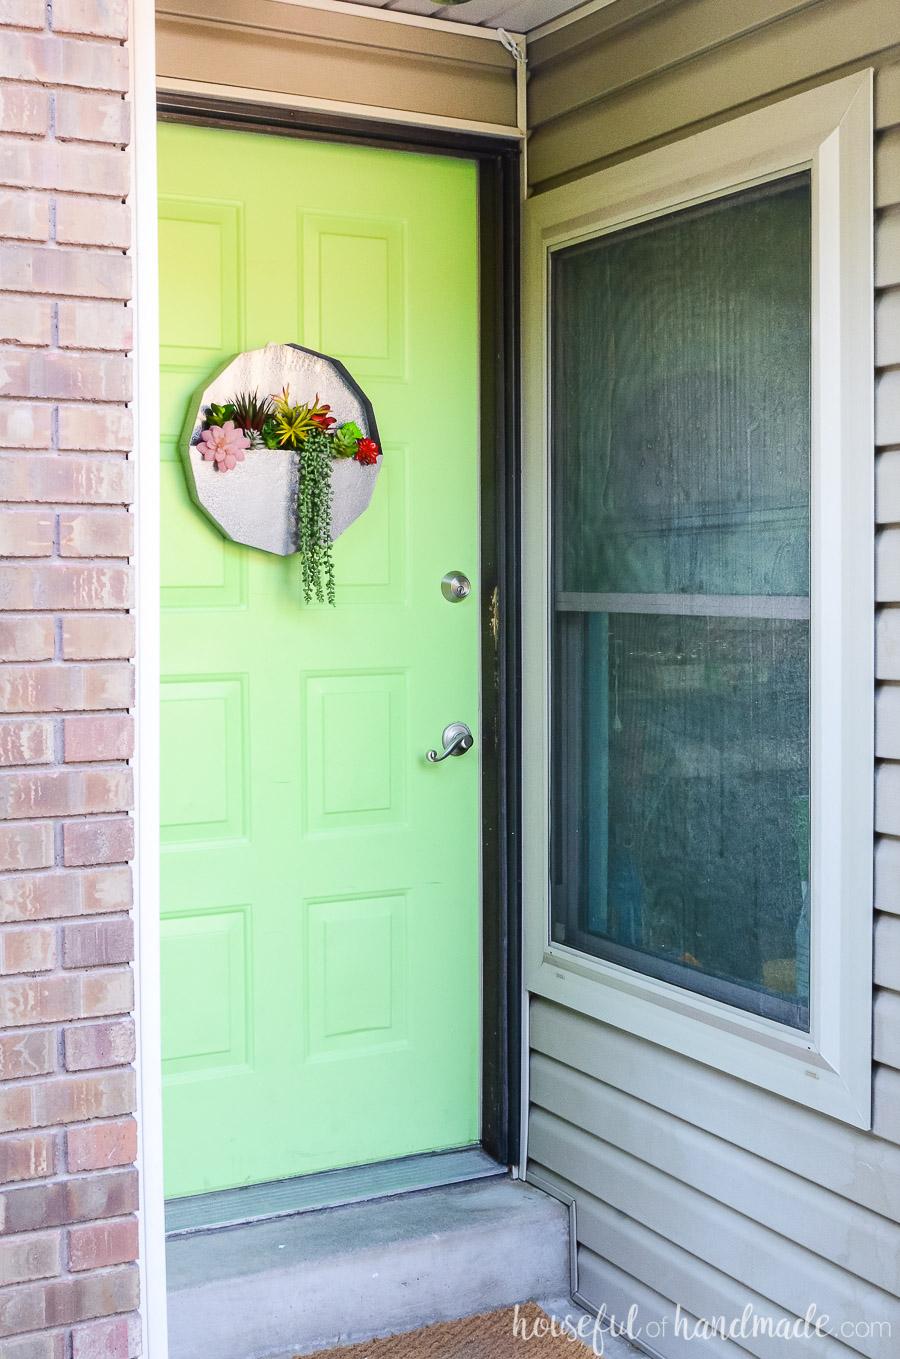 A succulent wall planter is a unique wreath door idea. Faux metal planter on a green door next to almond siding.